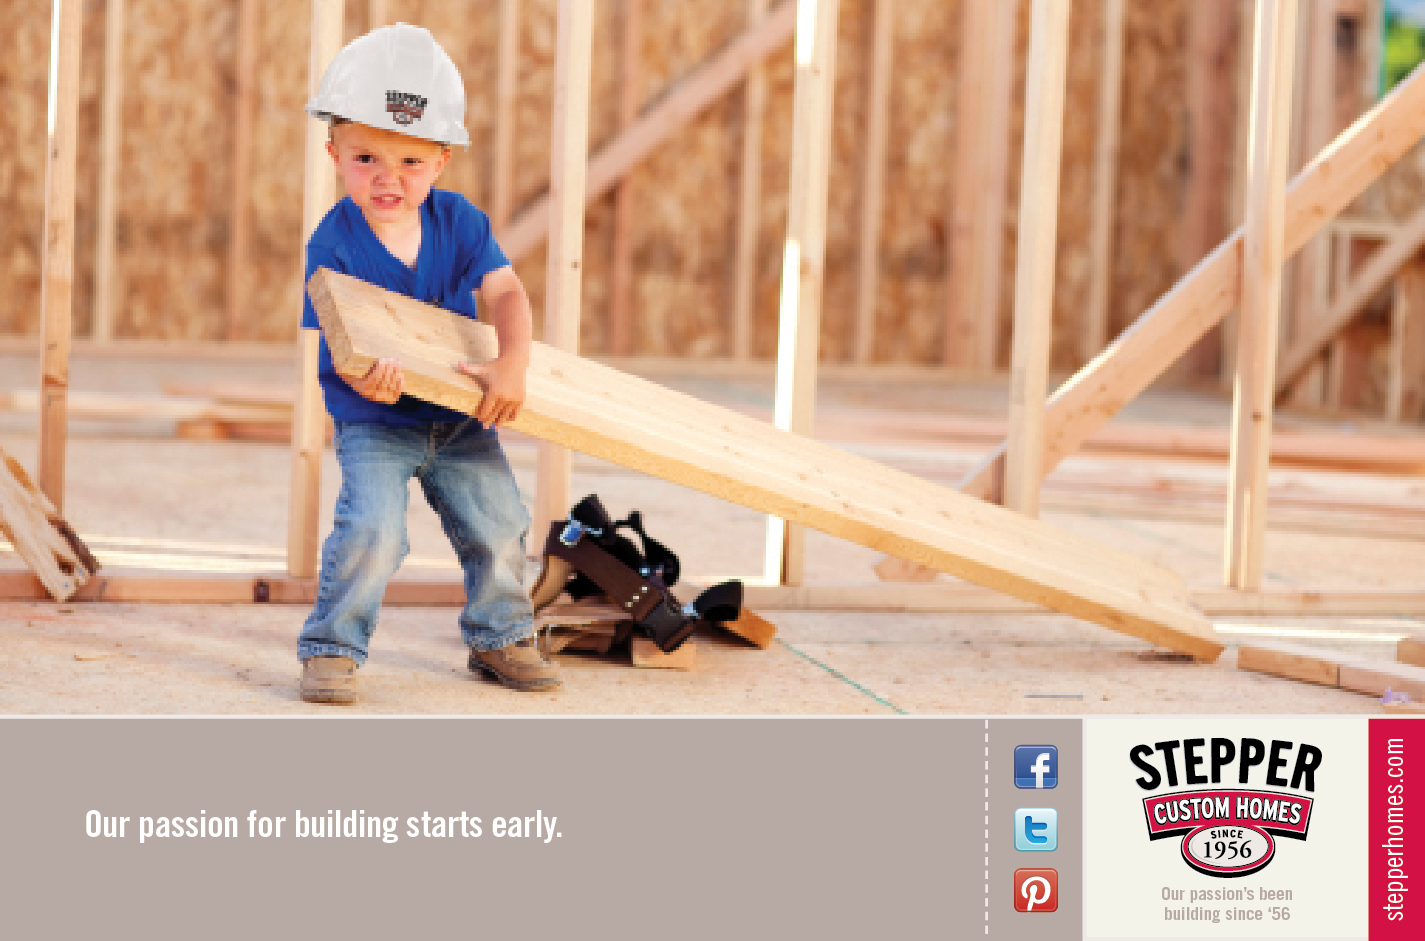 STEPPER - Calgarys Child ad - 9.5x6.275 - Jan23 - PRINT.jpg